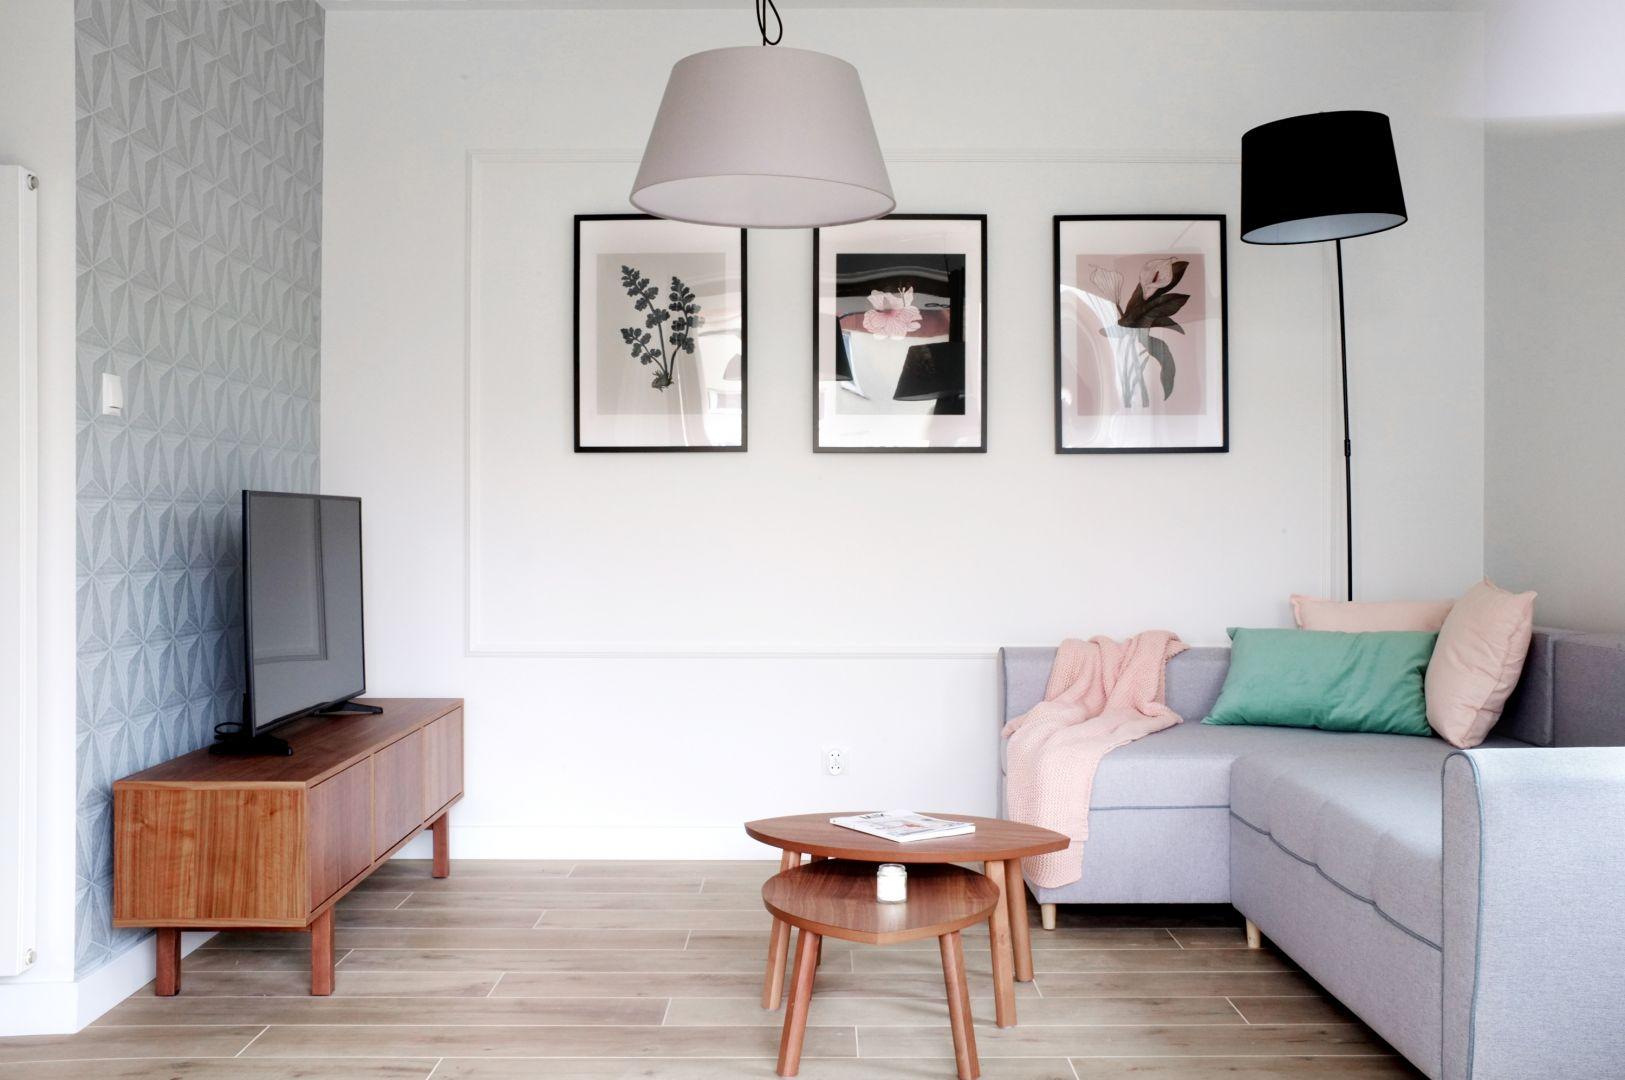 Jasny salon w bloku. Projekt Dekorian Home x Grid Studio Projektowe. Fot. Norbert Adamowicz